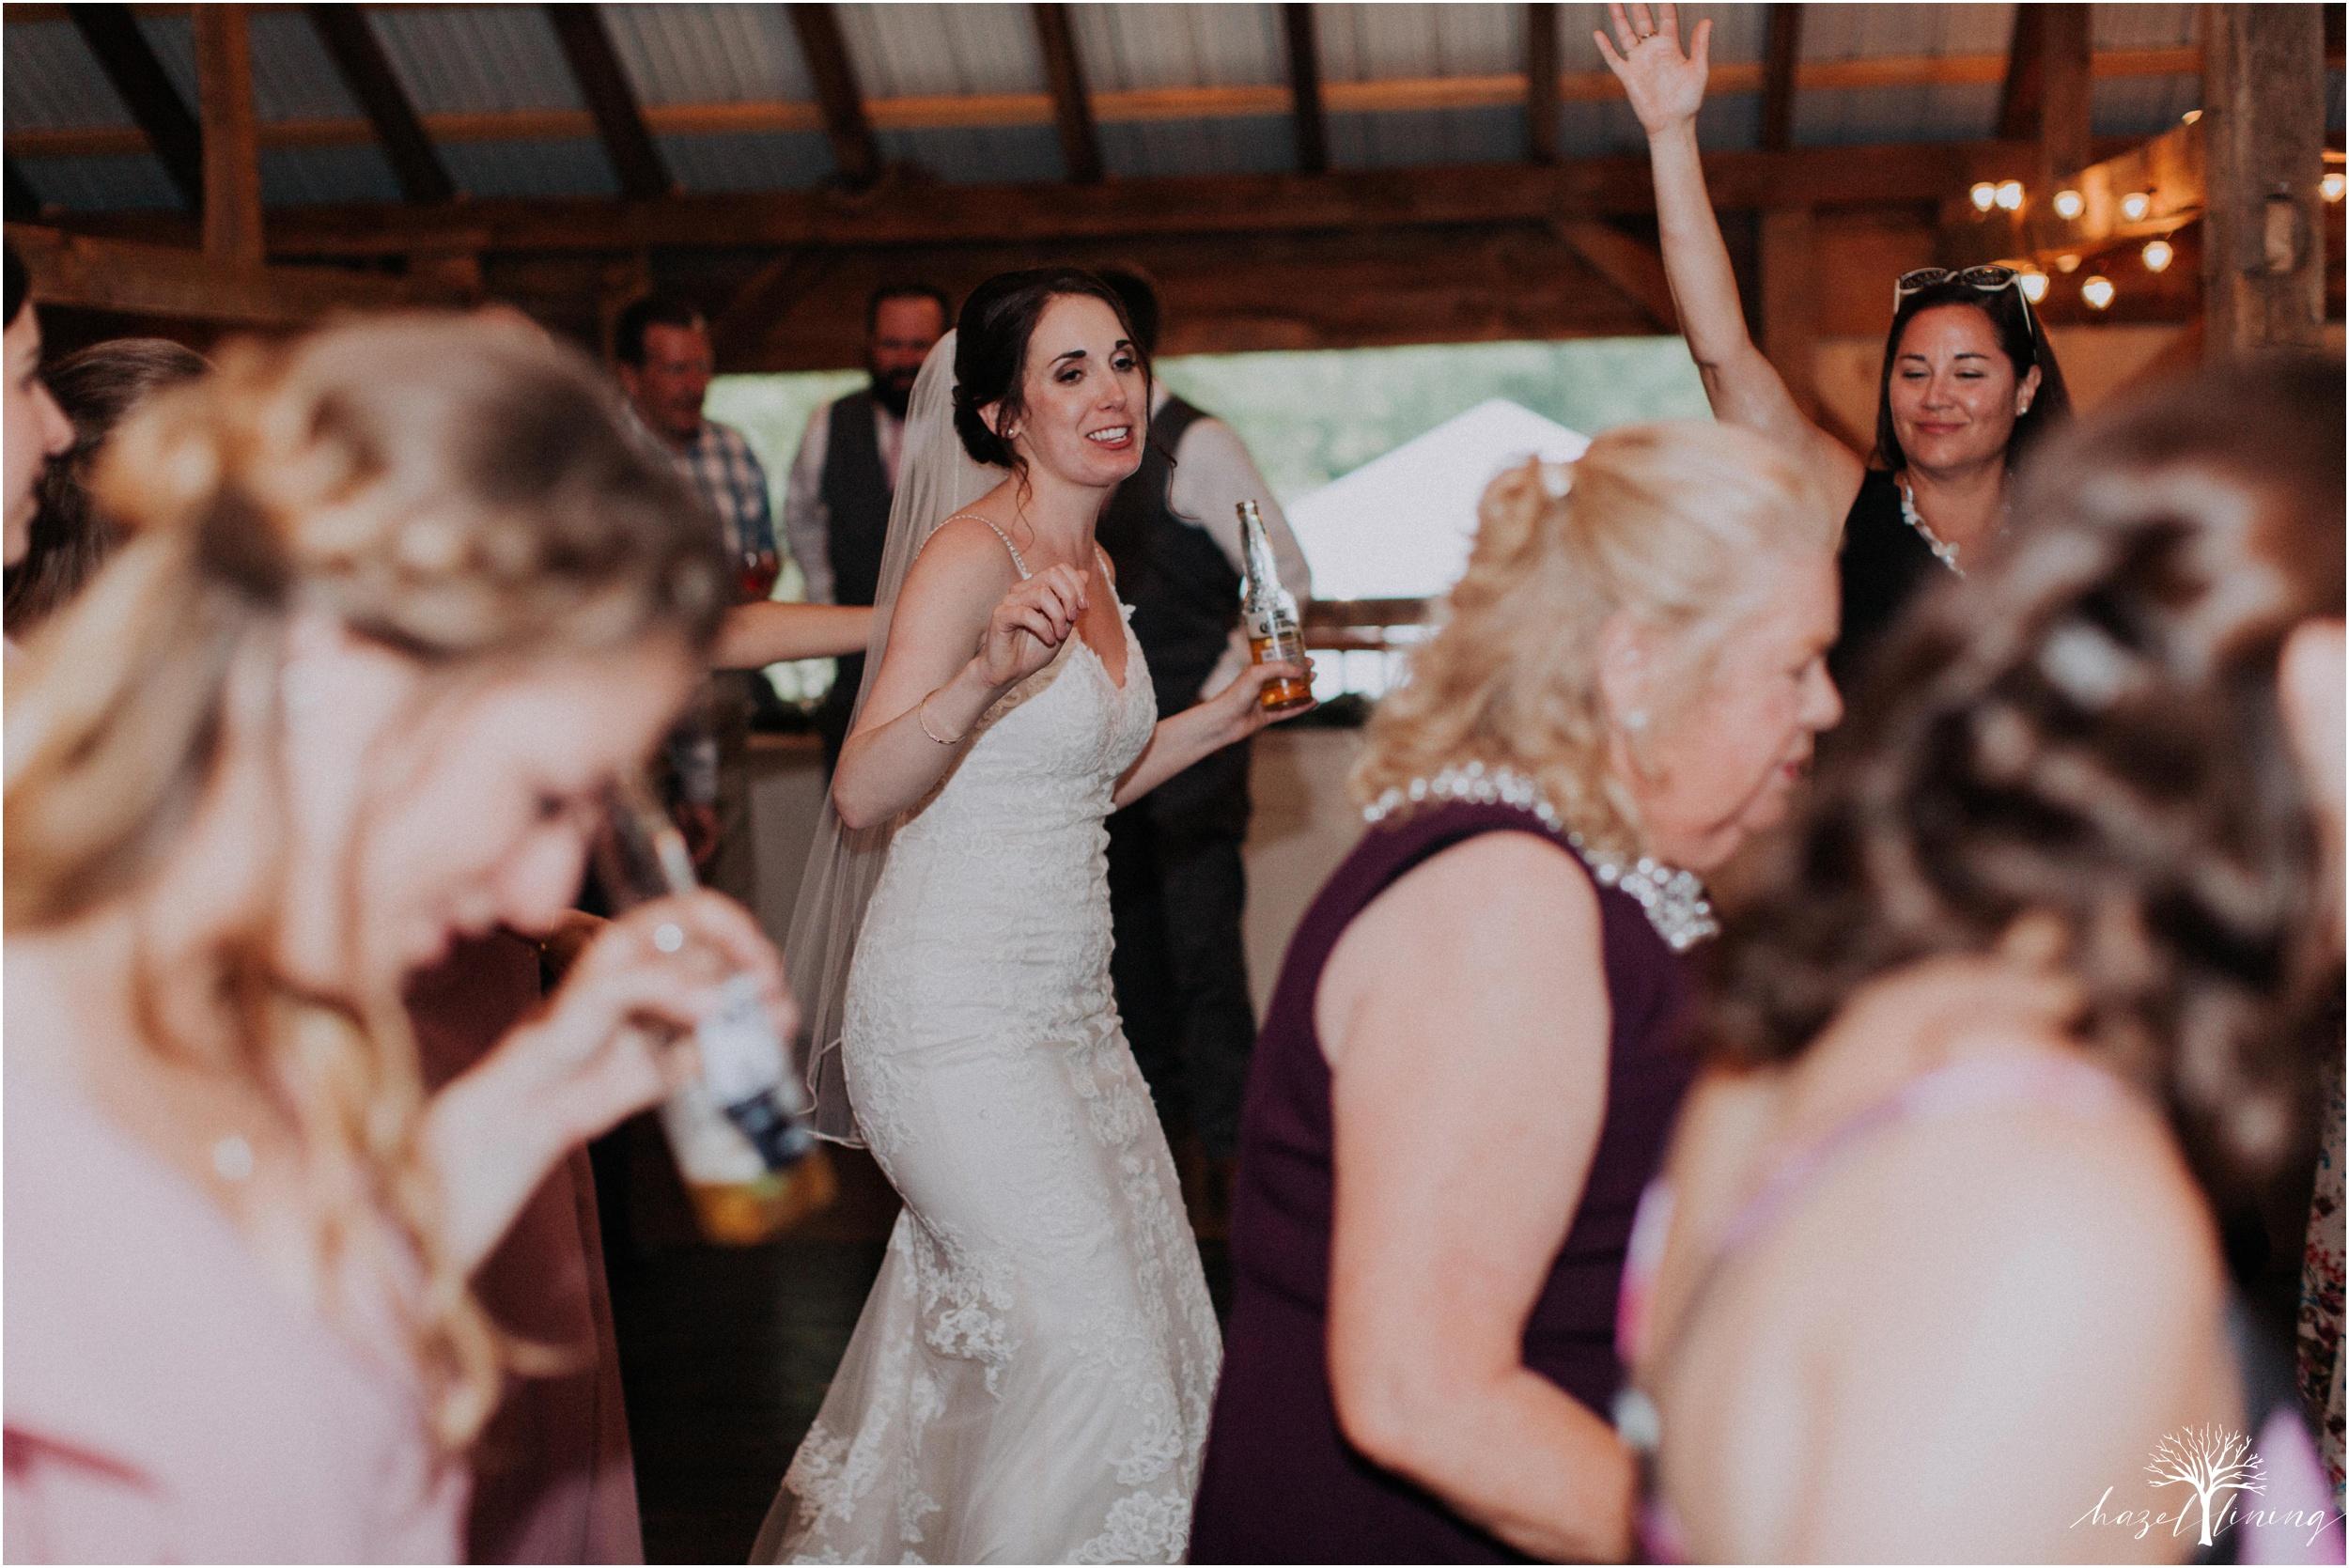 hazel-lining-travel-wedding-elopement-photography-lisa-landon-shoemaker-the-farm-bakery-and-events-bucks-county-quakertown-pennsylvania-summer-country-outdoor-farm-wedding_0150.jpg